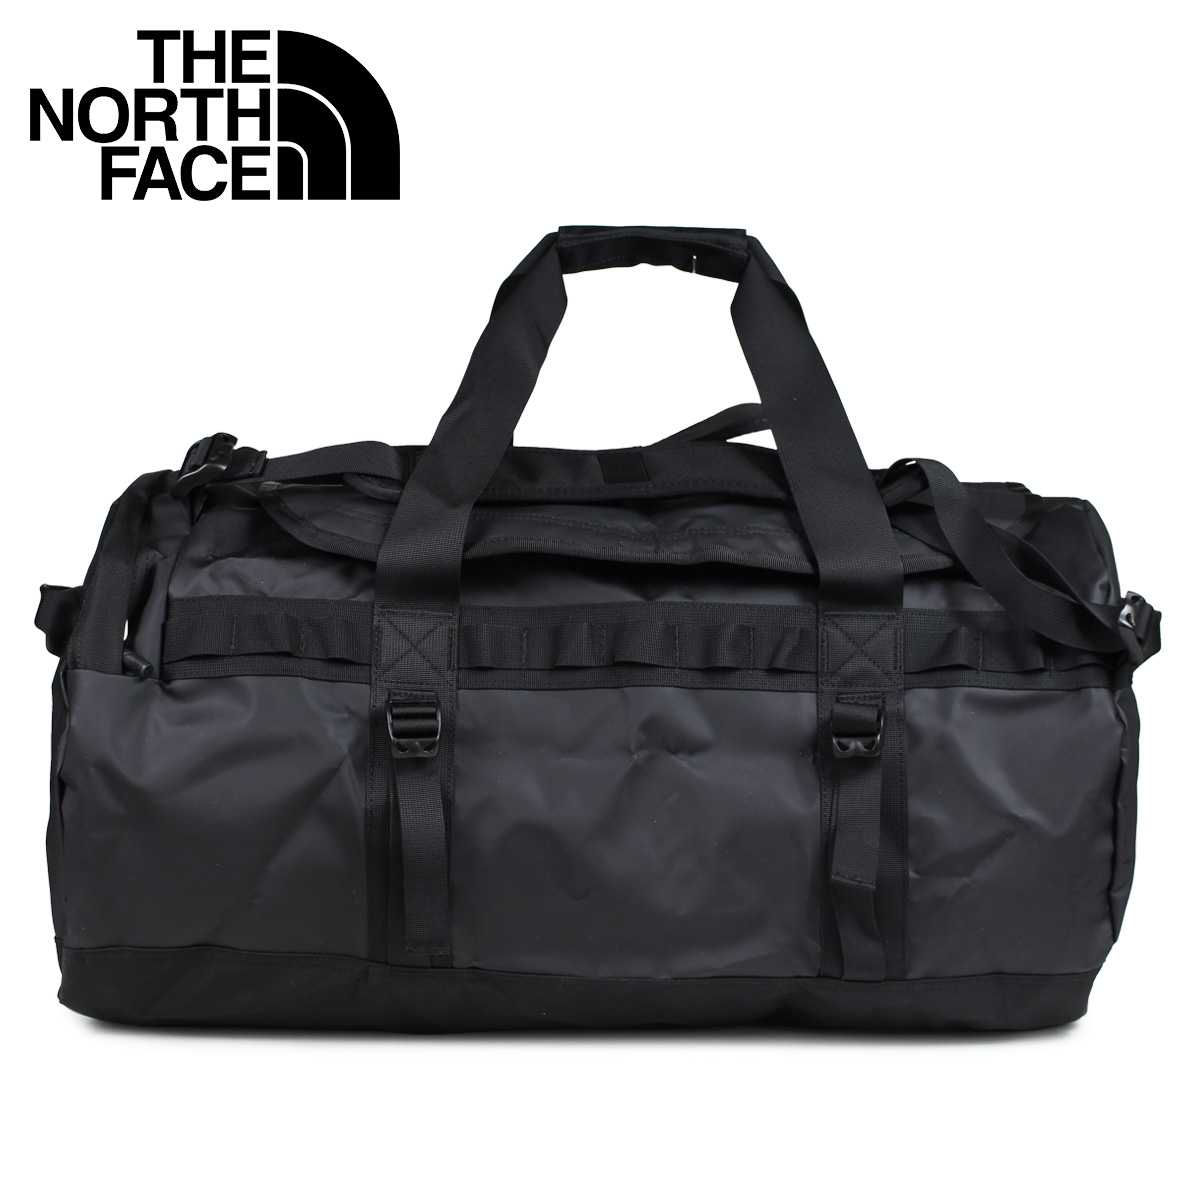 3cedfefa1 THE NORTH FACE North Face rucksack duffel bag Boston bag men 2WAY BASE CAMP  DUFFEL M black black NF0A3ETP